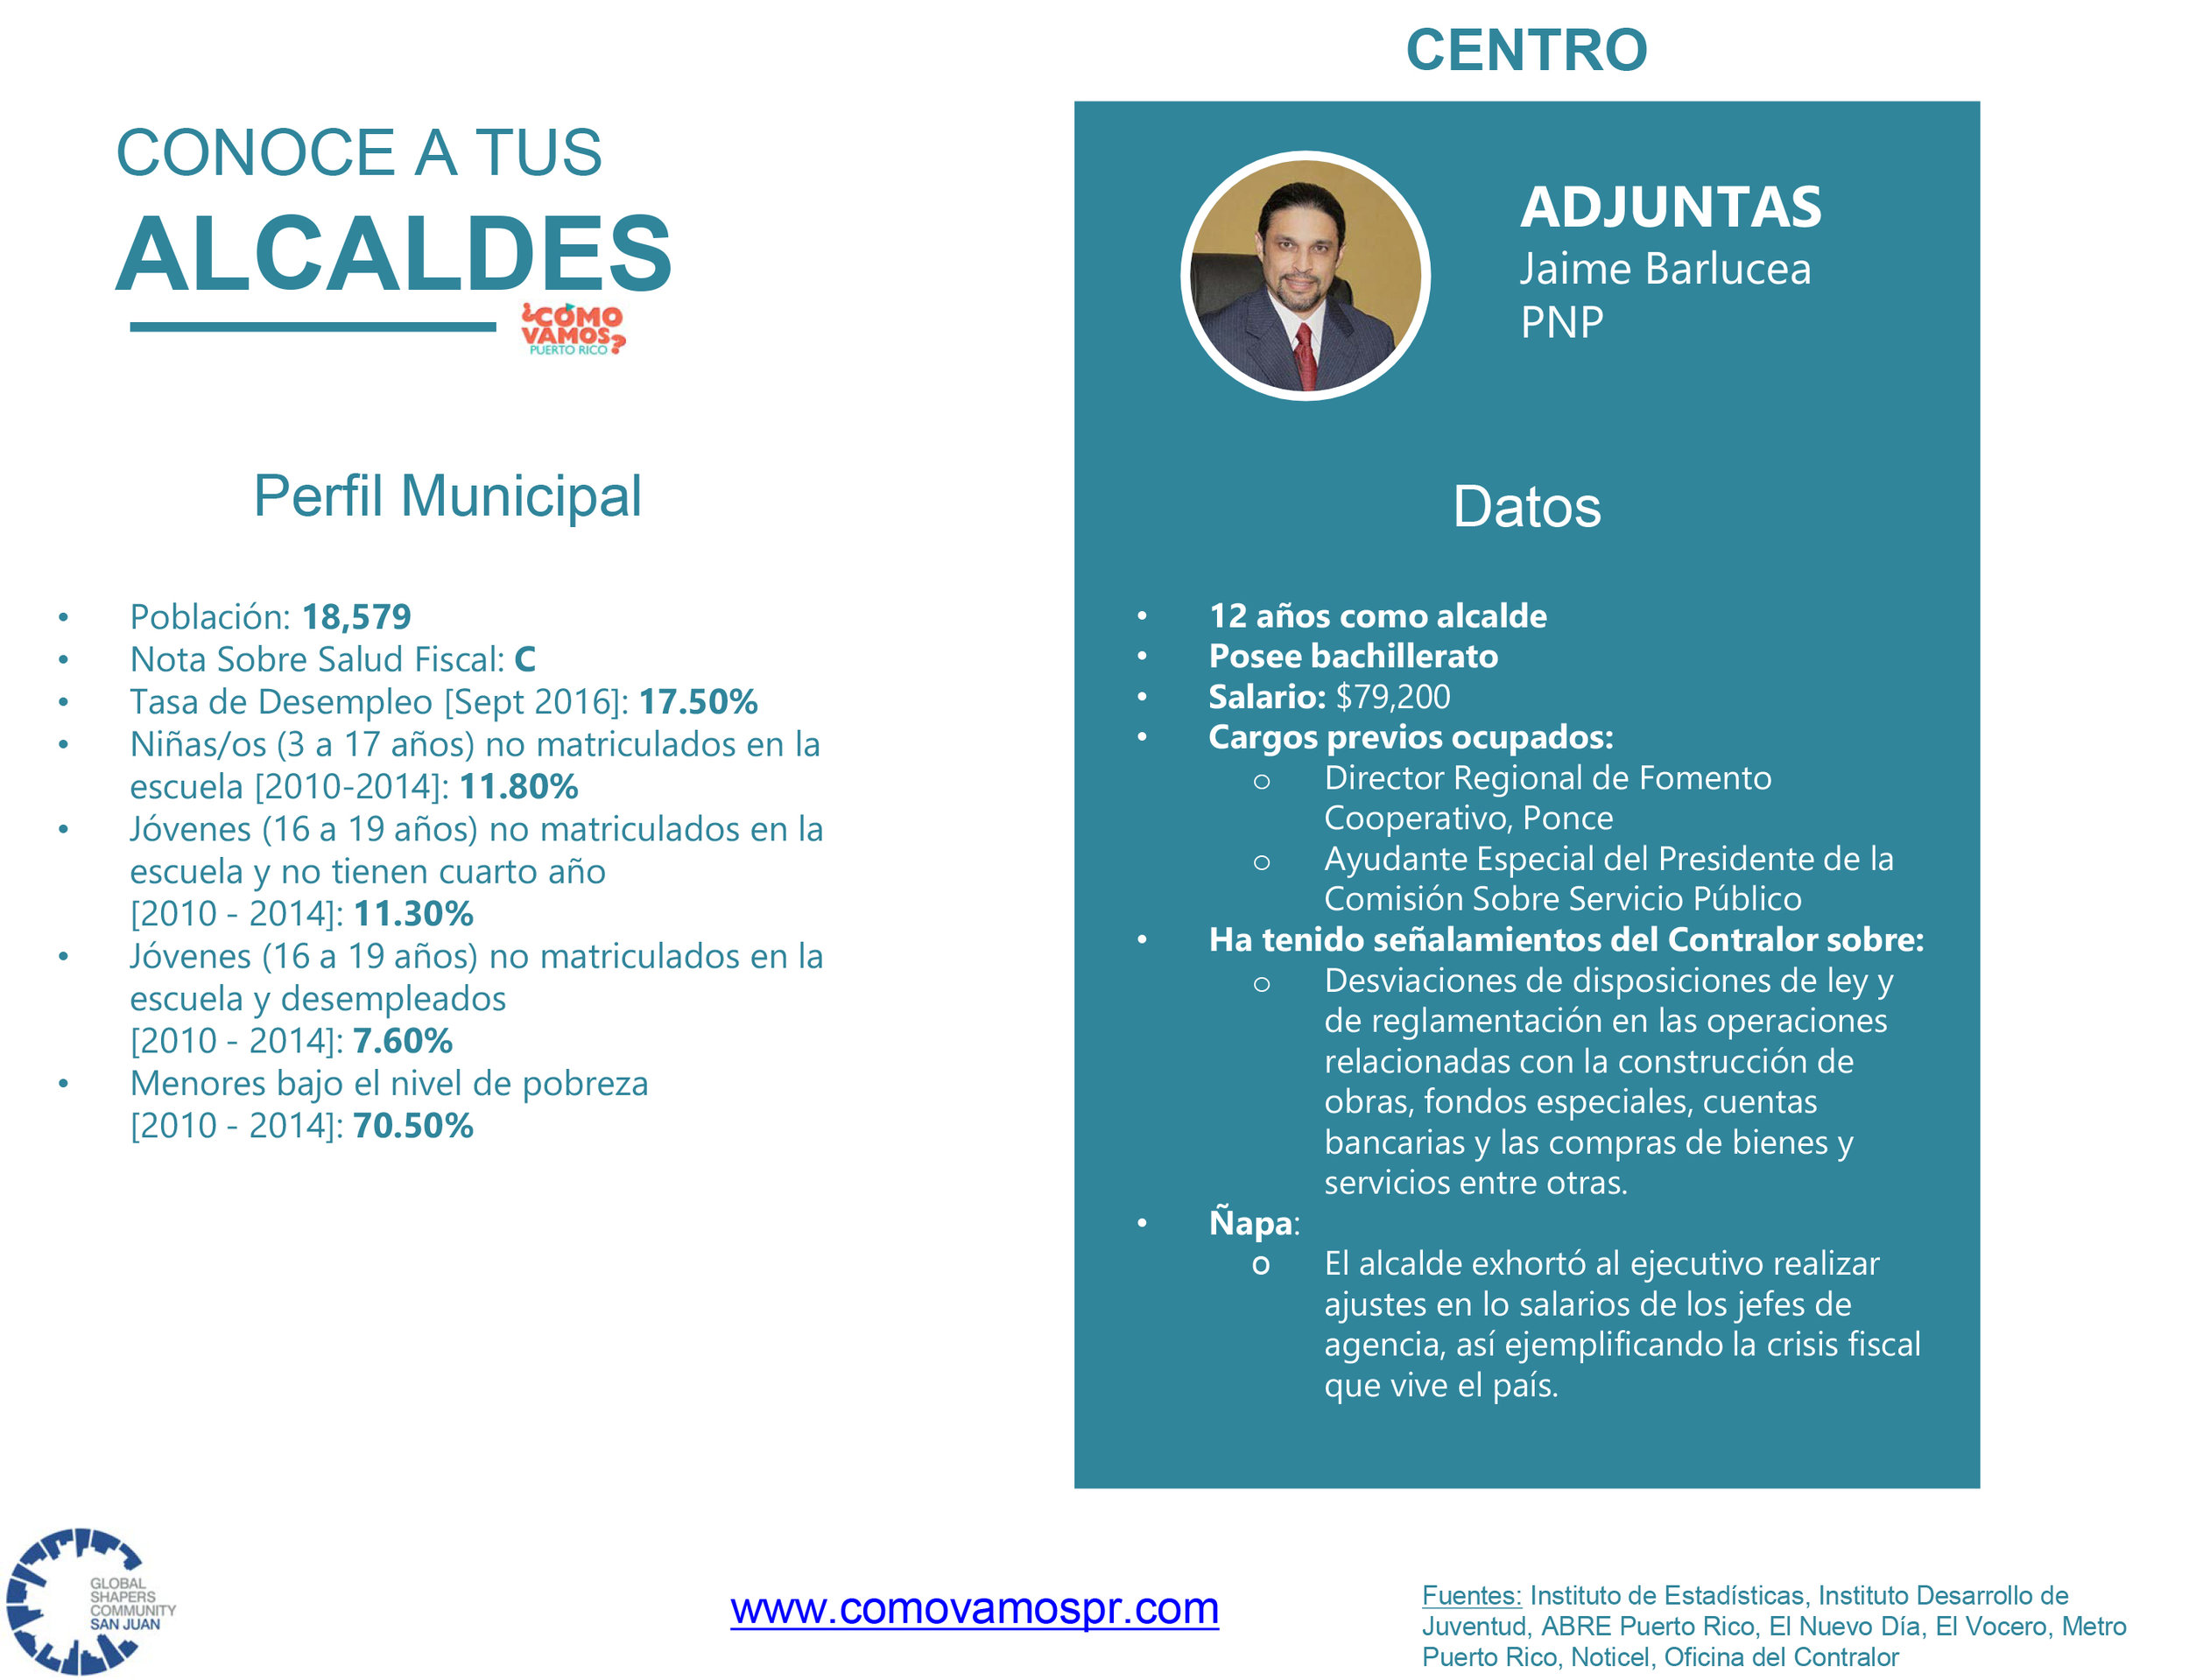 Alcaldes_Centro_Adjuntas.jpg